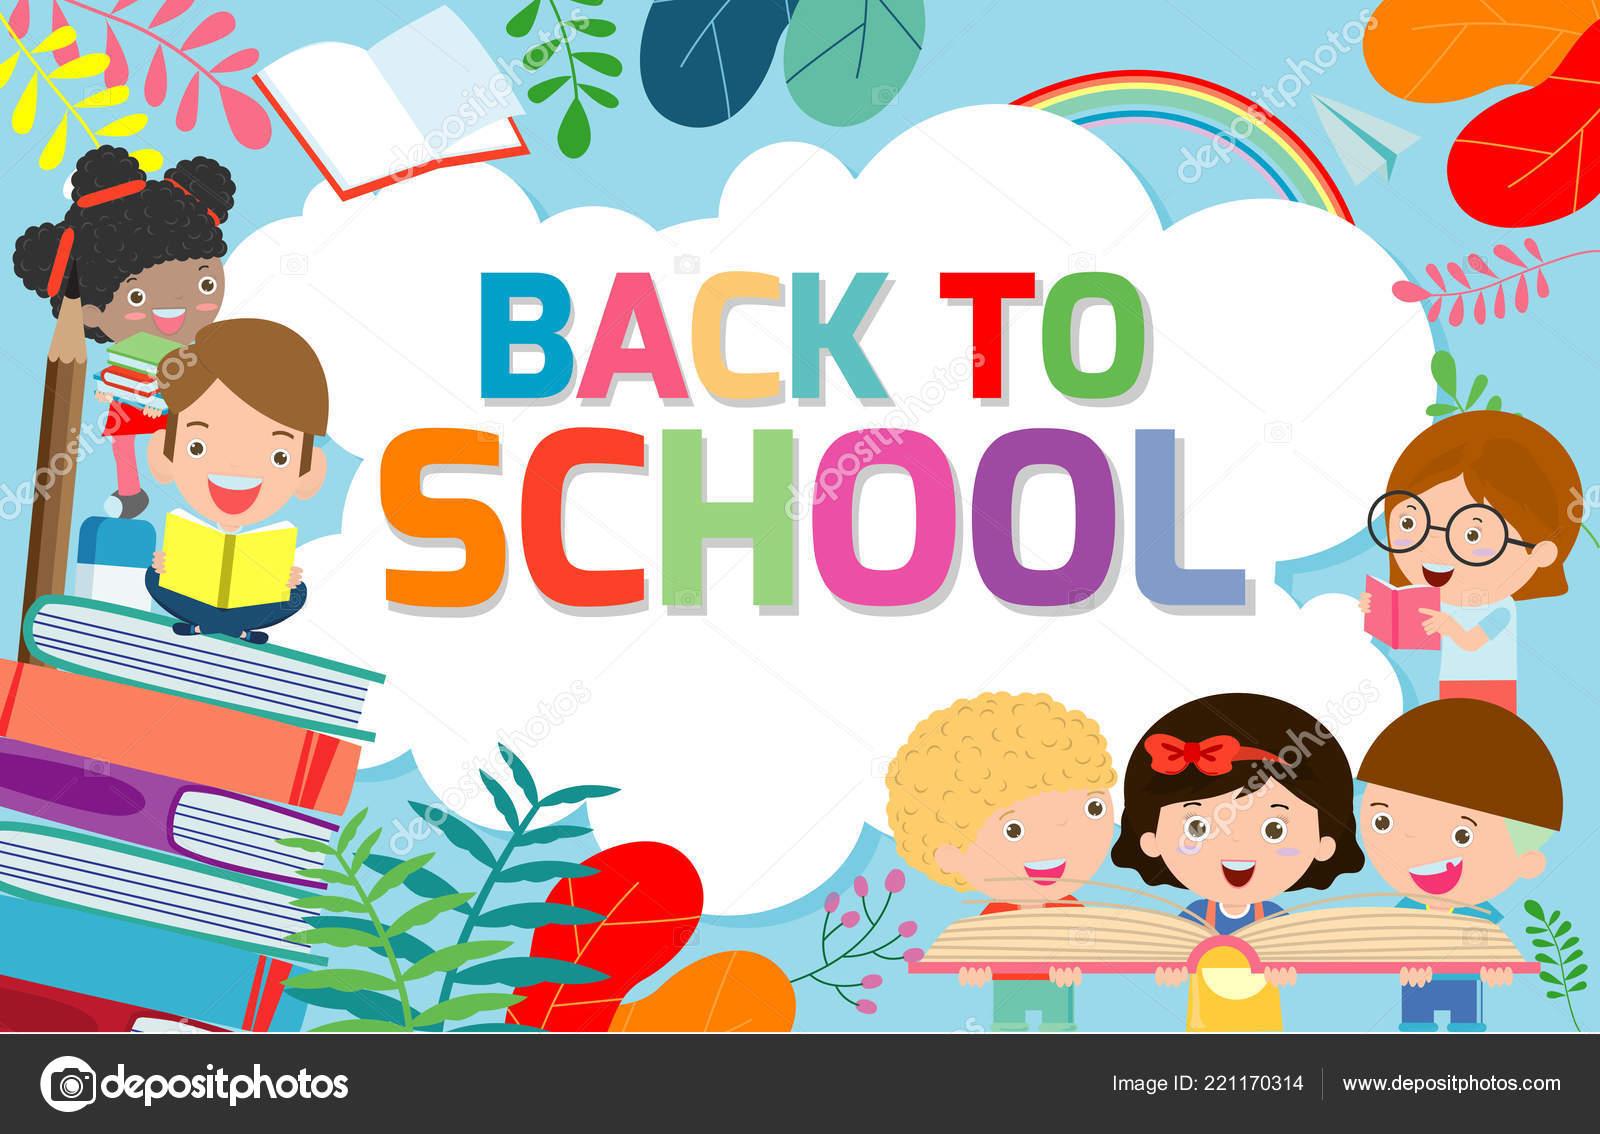 Back School Banner Background Welcome Back School Children Reading Book Stock Vector C Phanuchat10700 Gmail Com 221170314